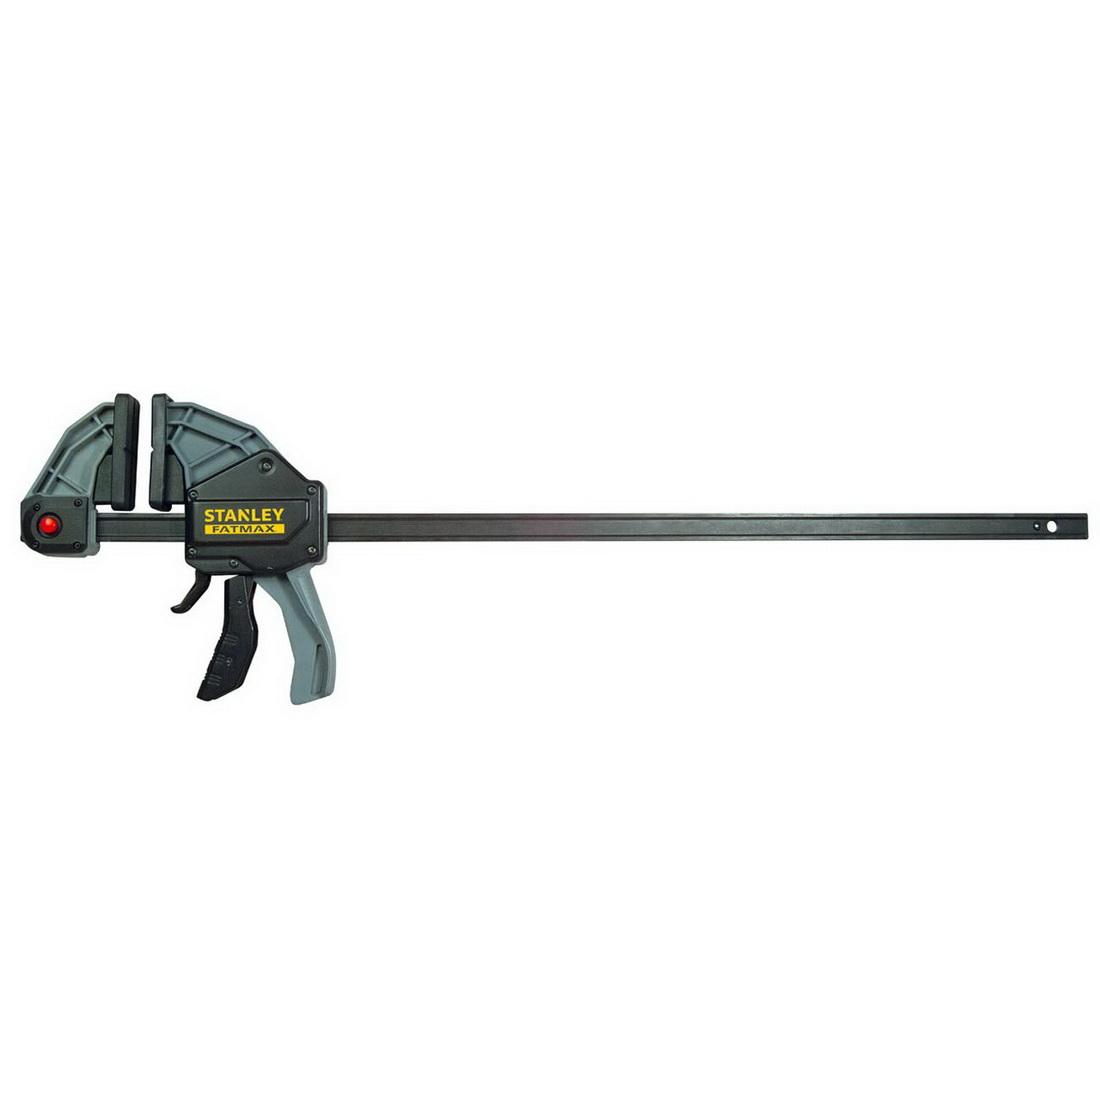 Fatmax XL 900mm x 92mm Trigger Bar Clamp